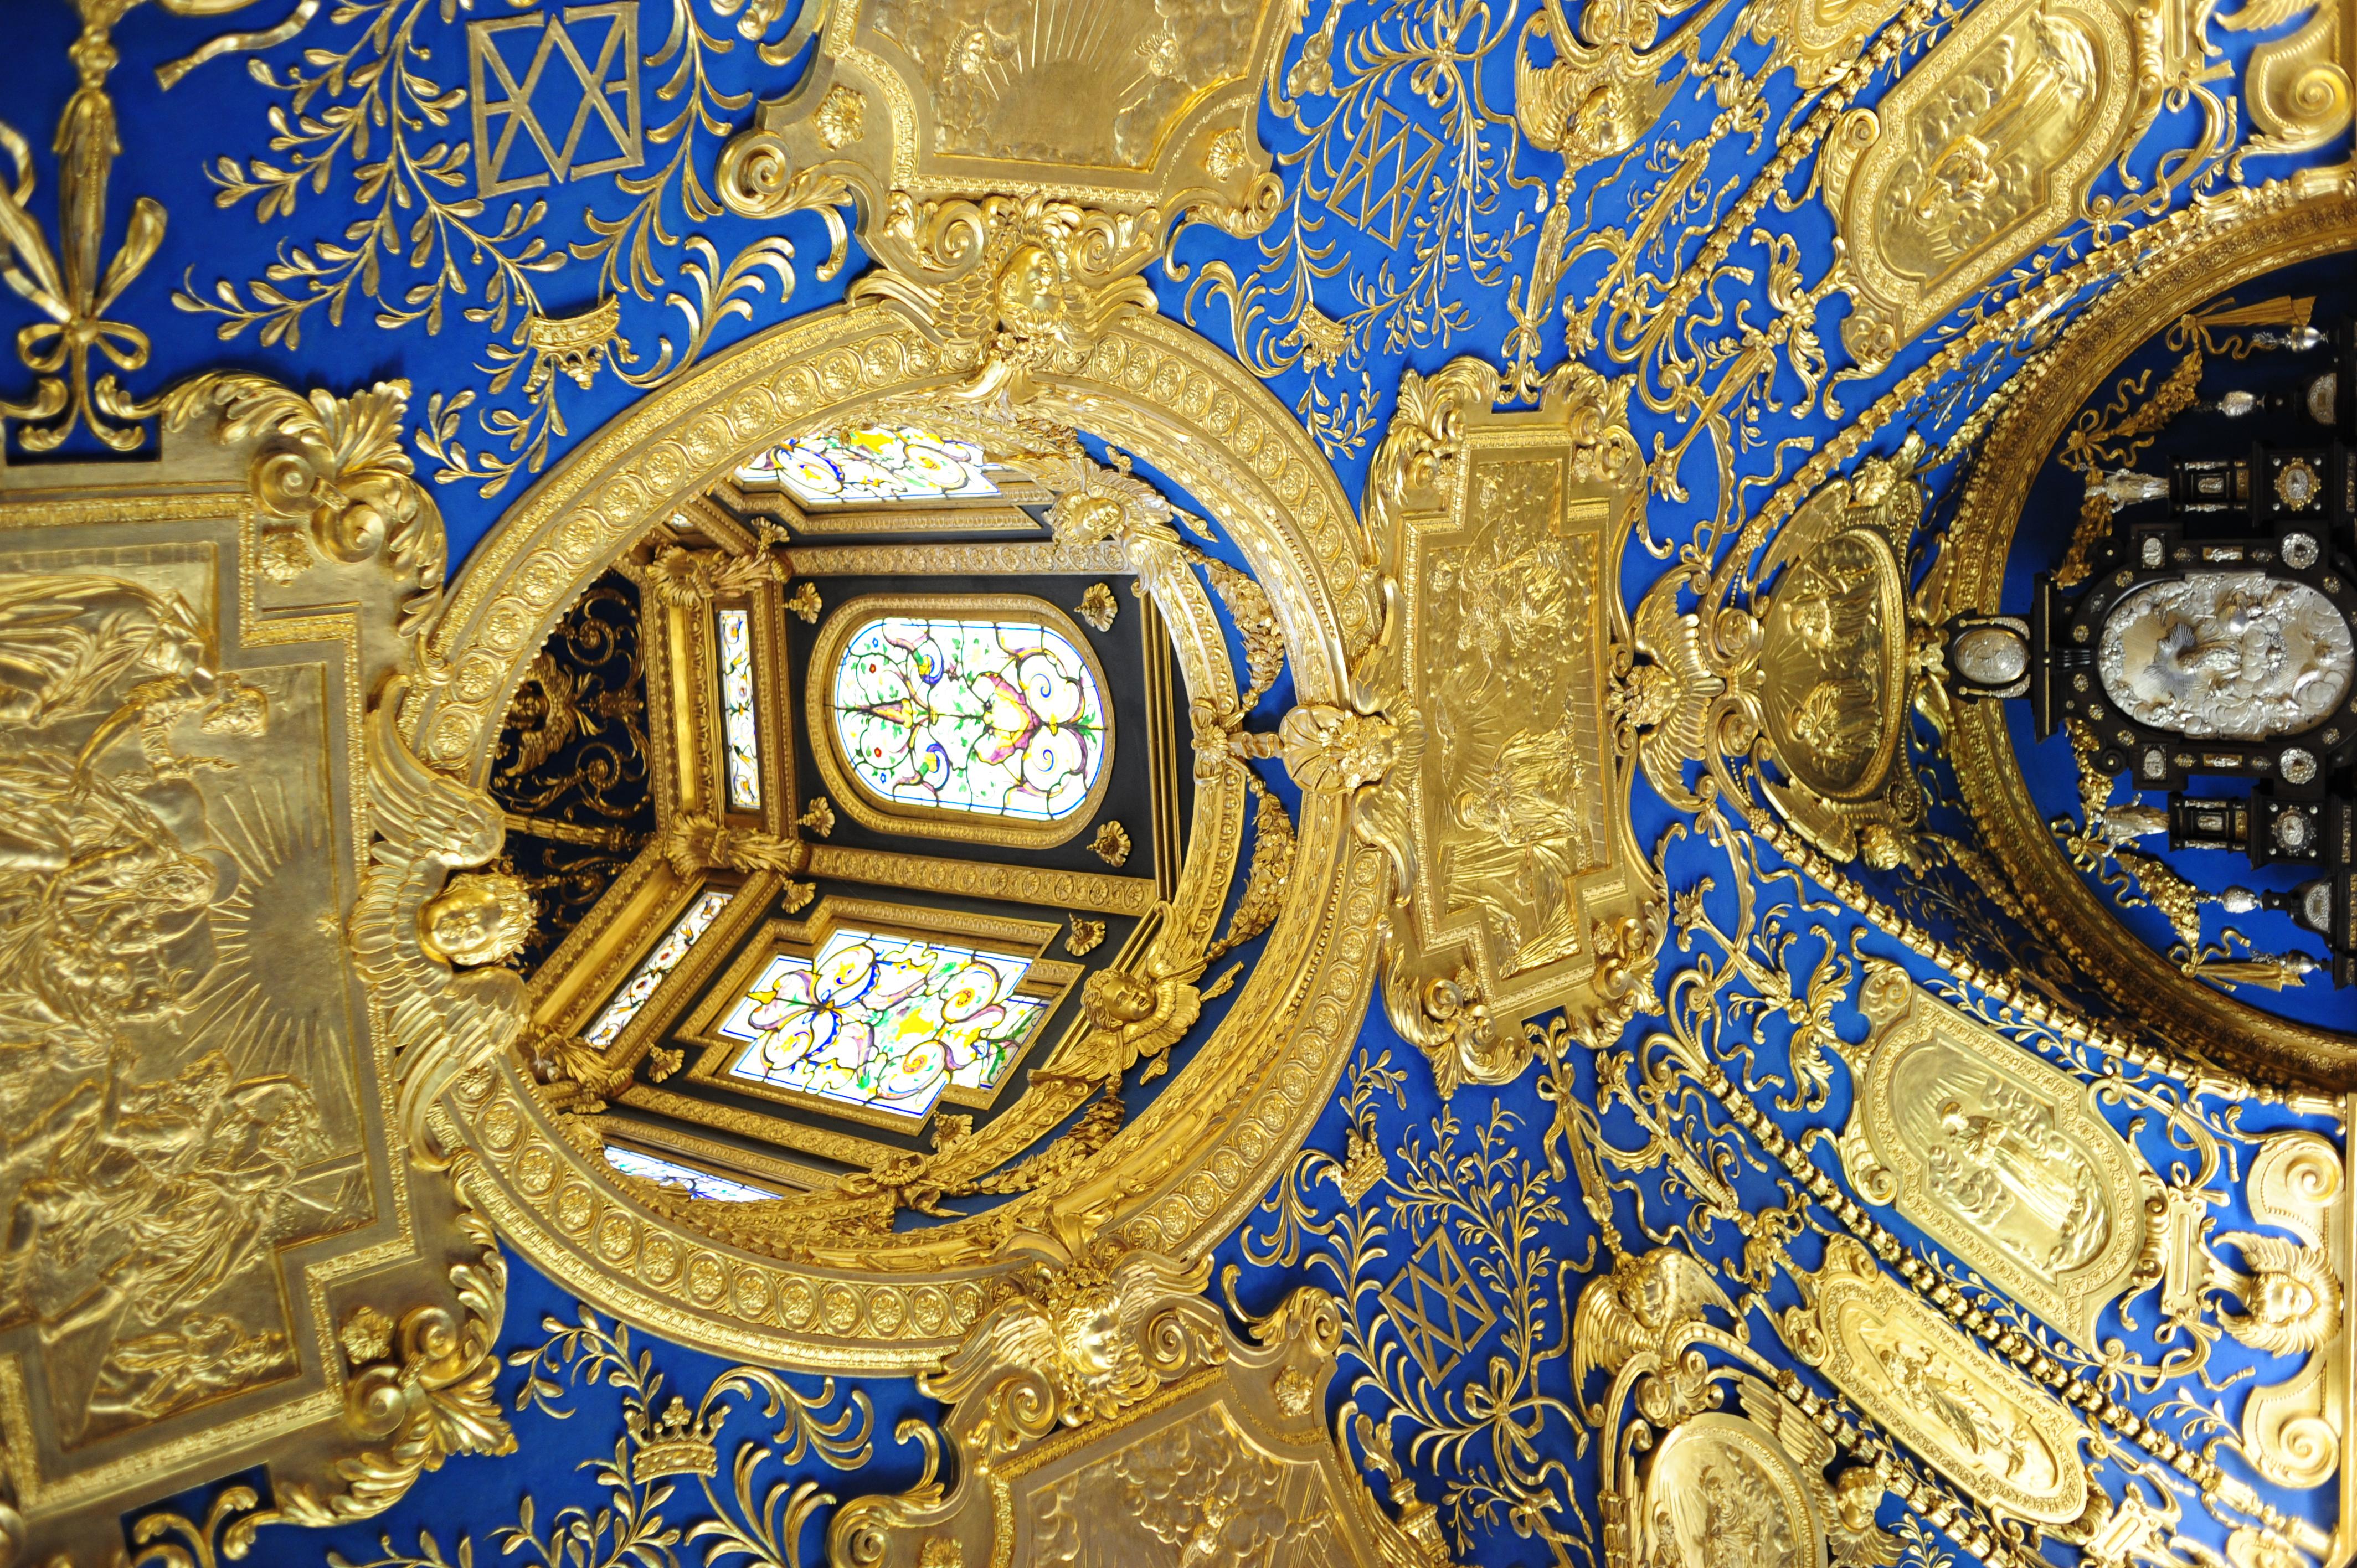 Ornate ceiling inside Residenz, Munich